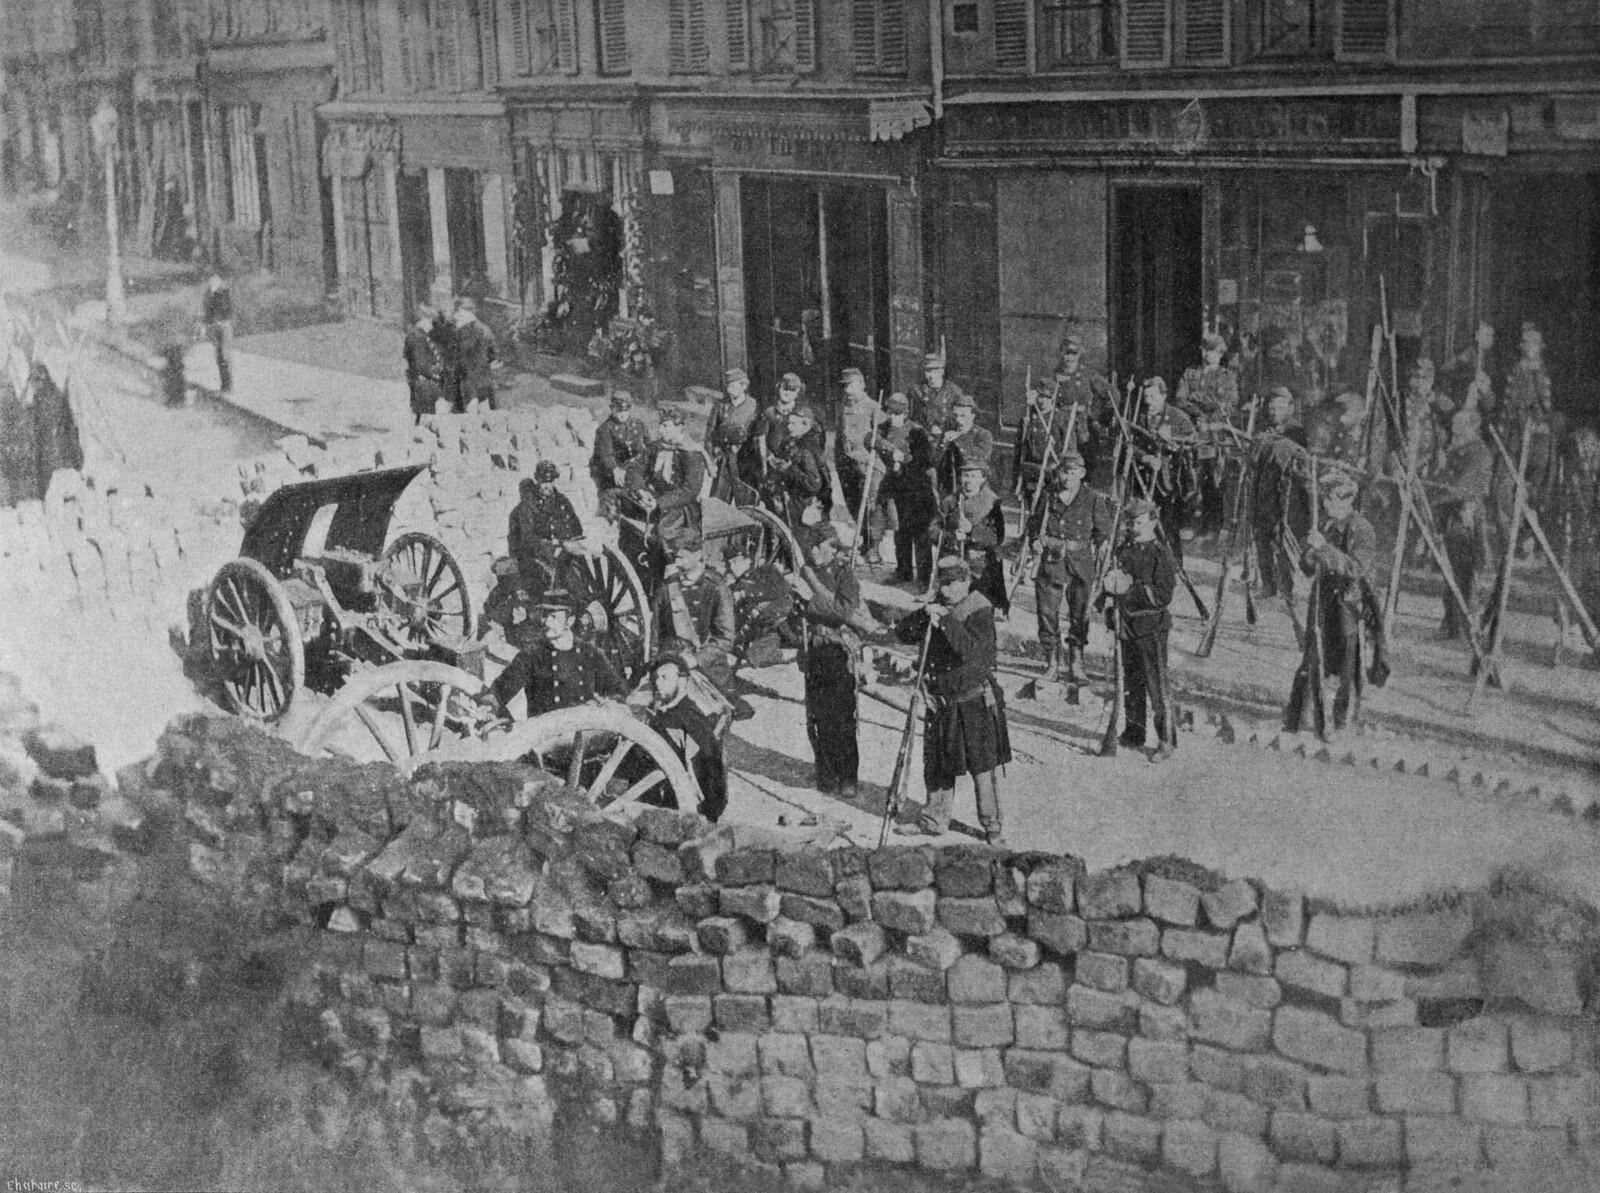 1871. Баррикада на улице Абессес перед битвой в мае 1871 года на Монмартре